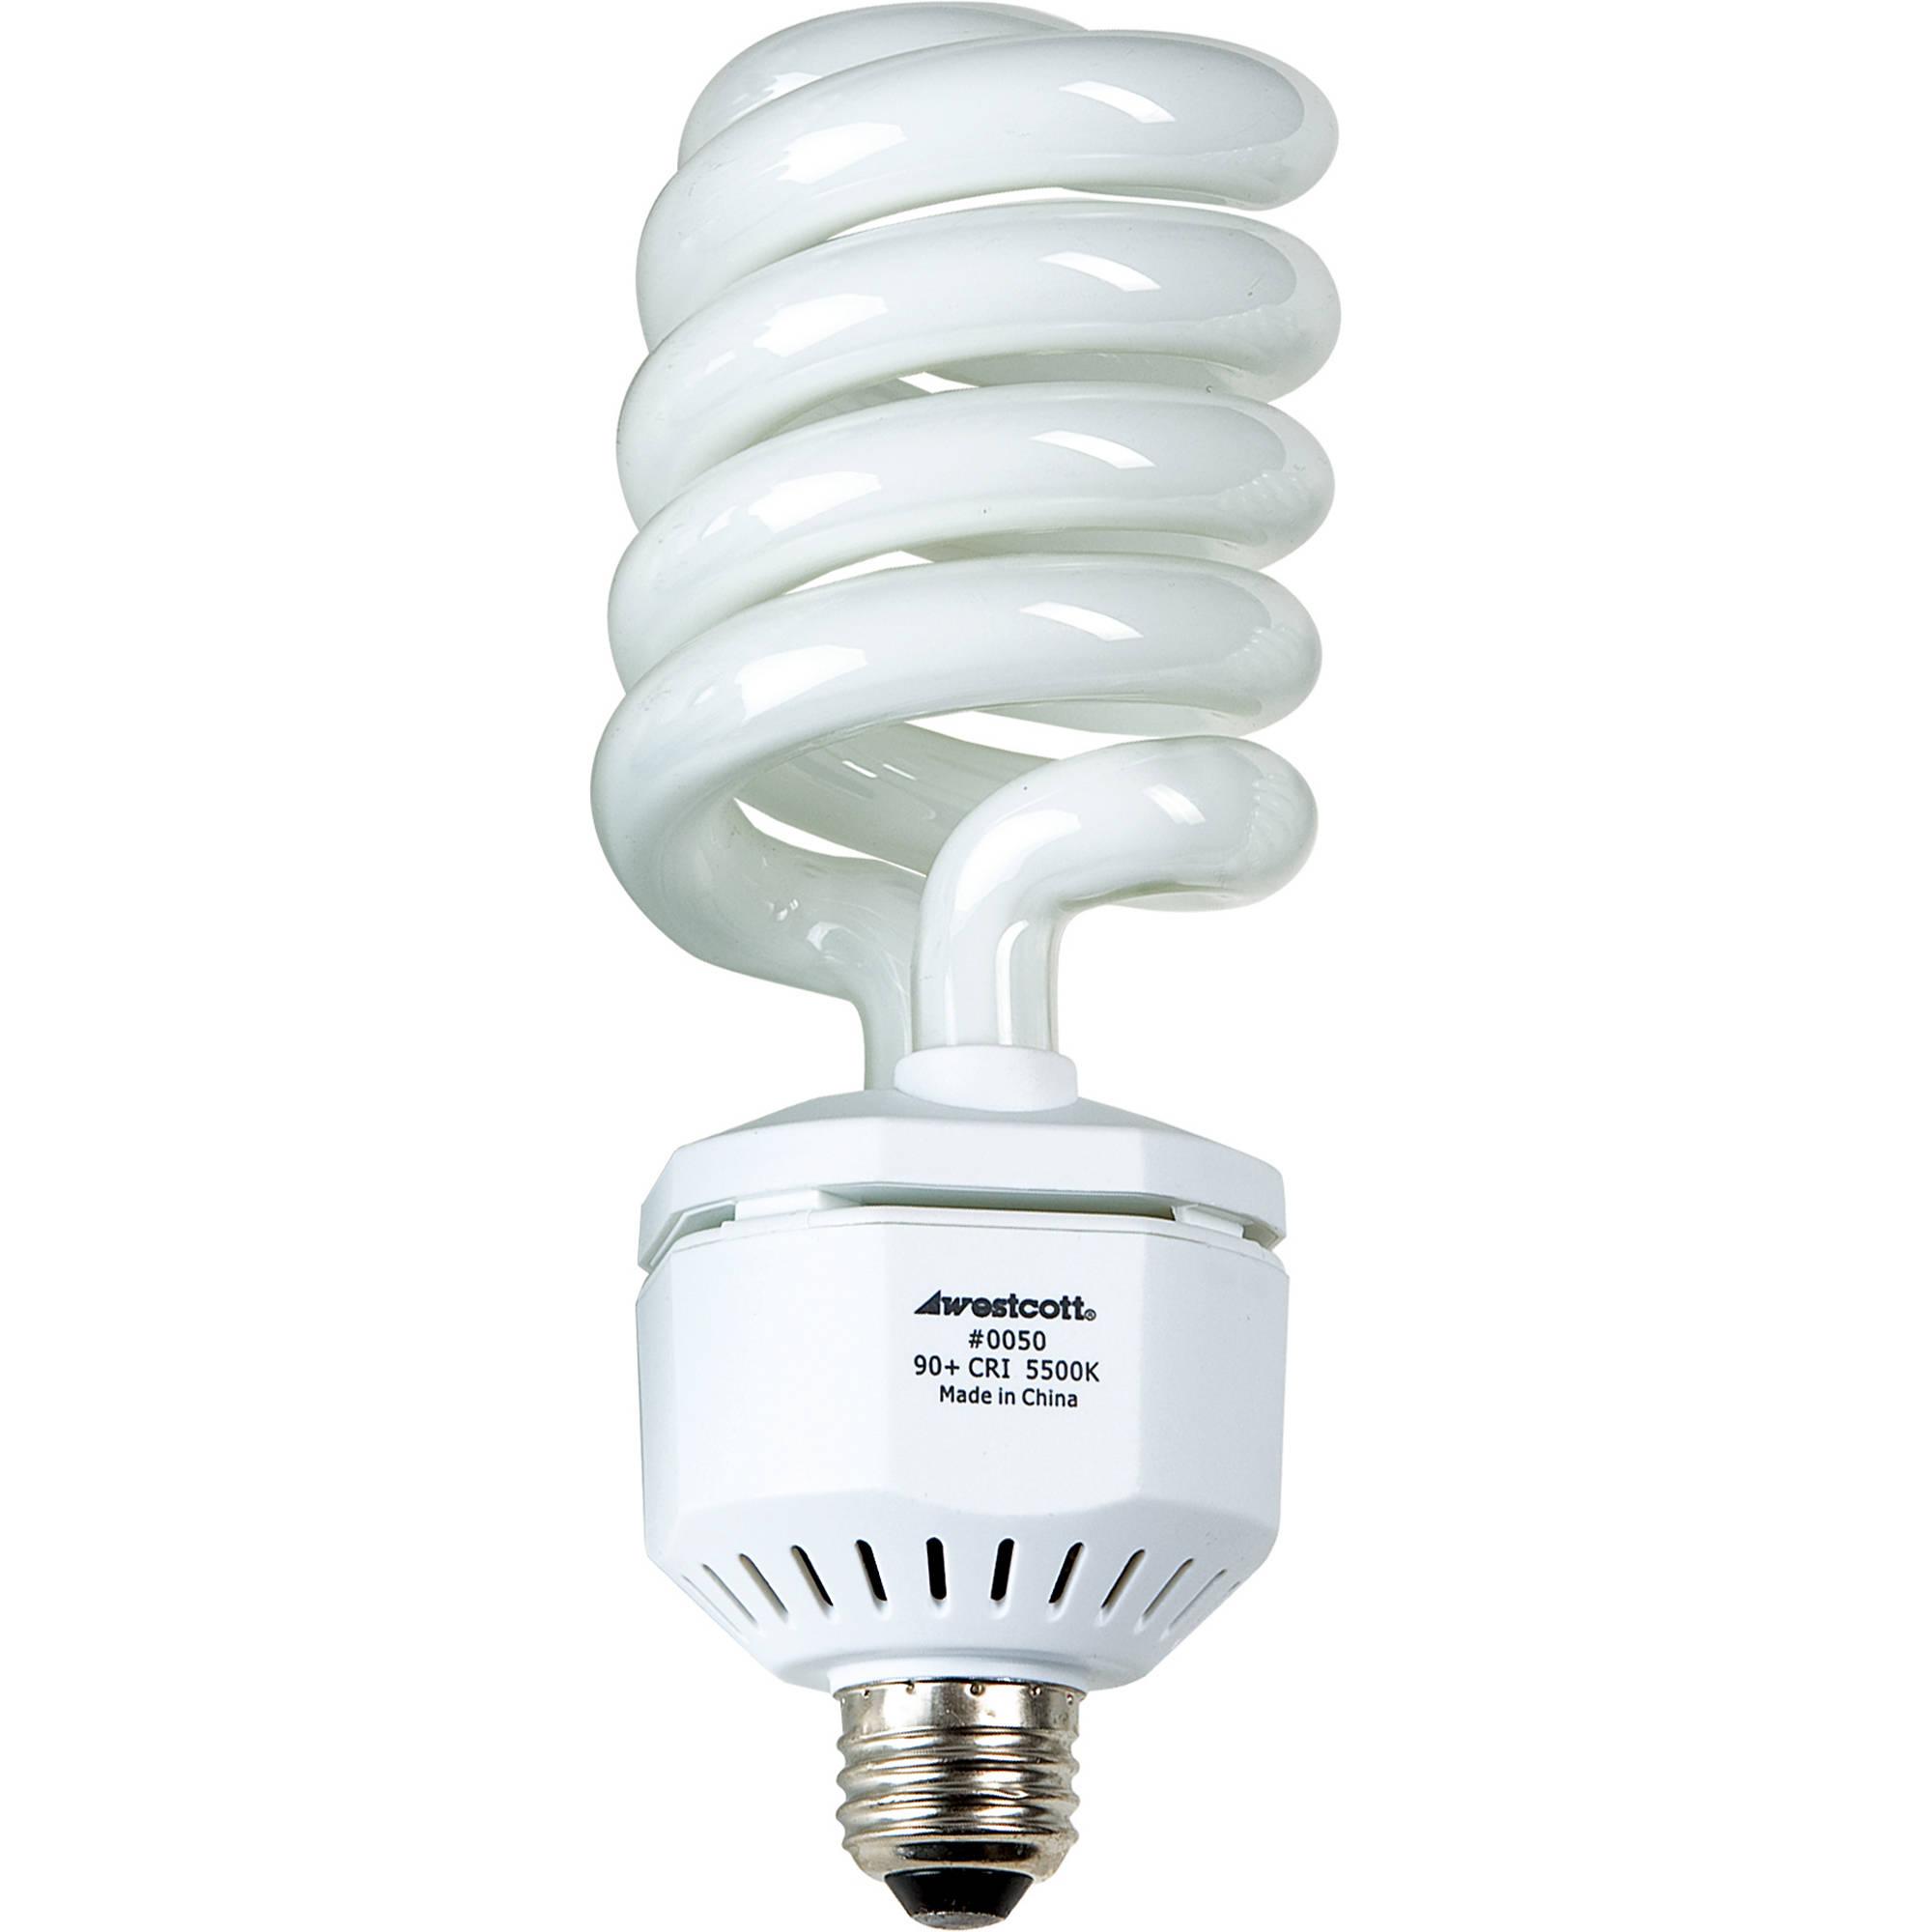 Westcott Fluorescent Lamp 50 Watts 120 Volts 5500k 0050 B H